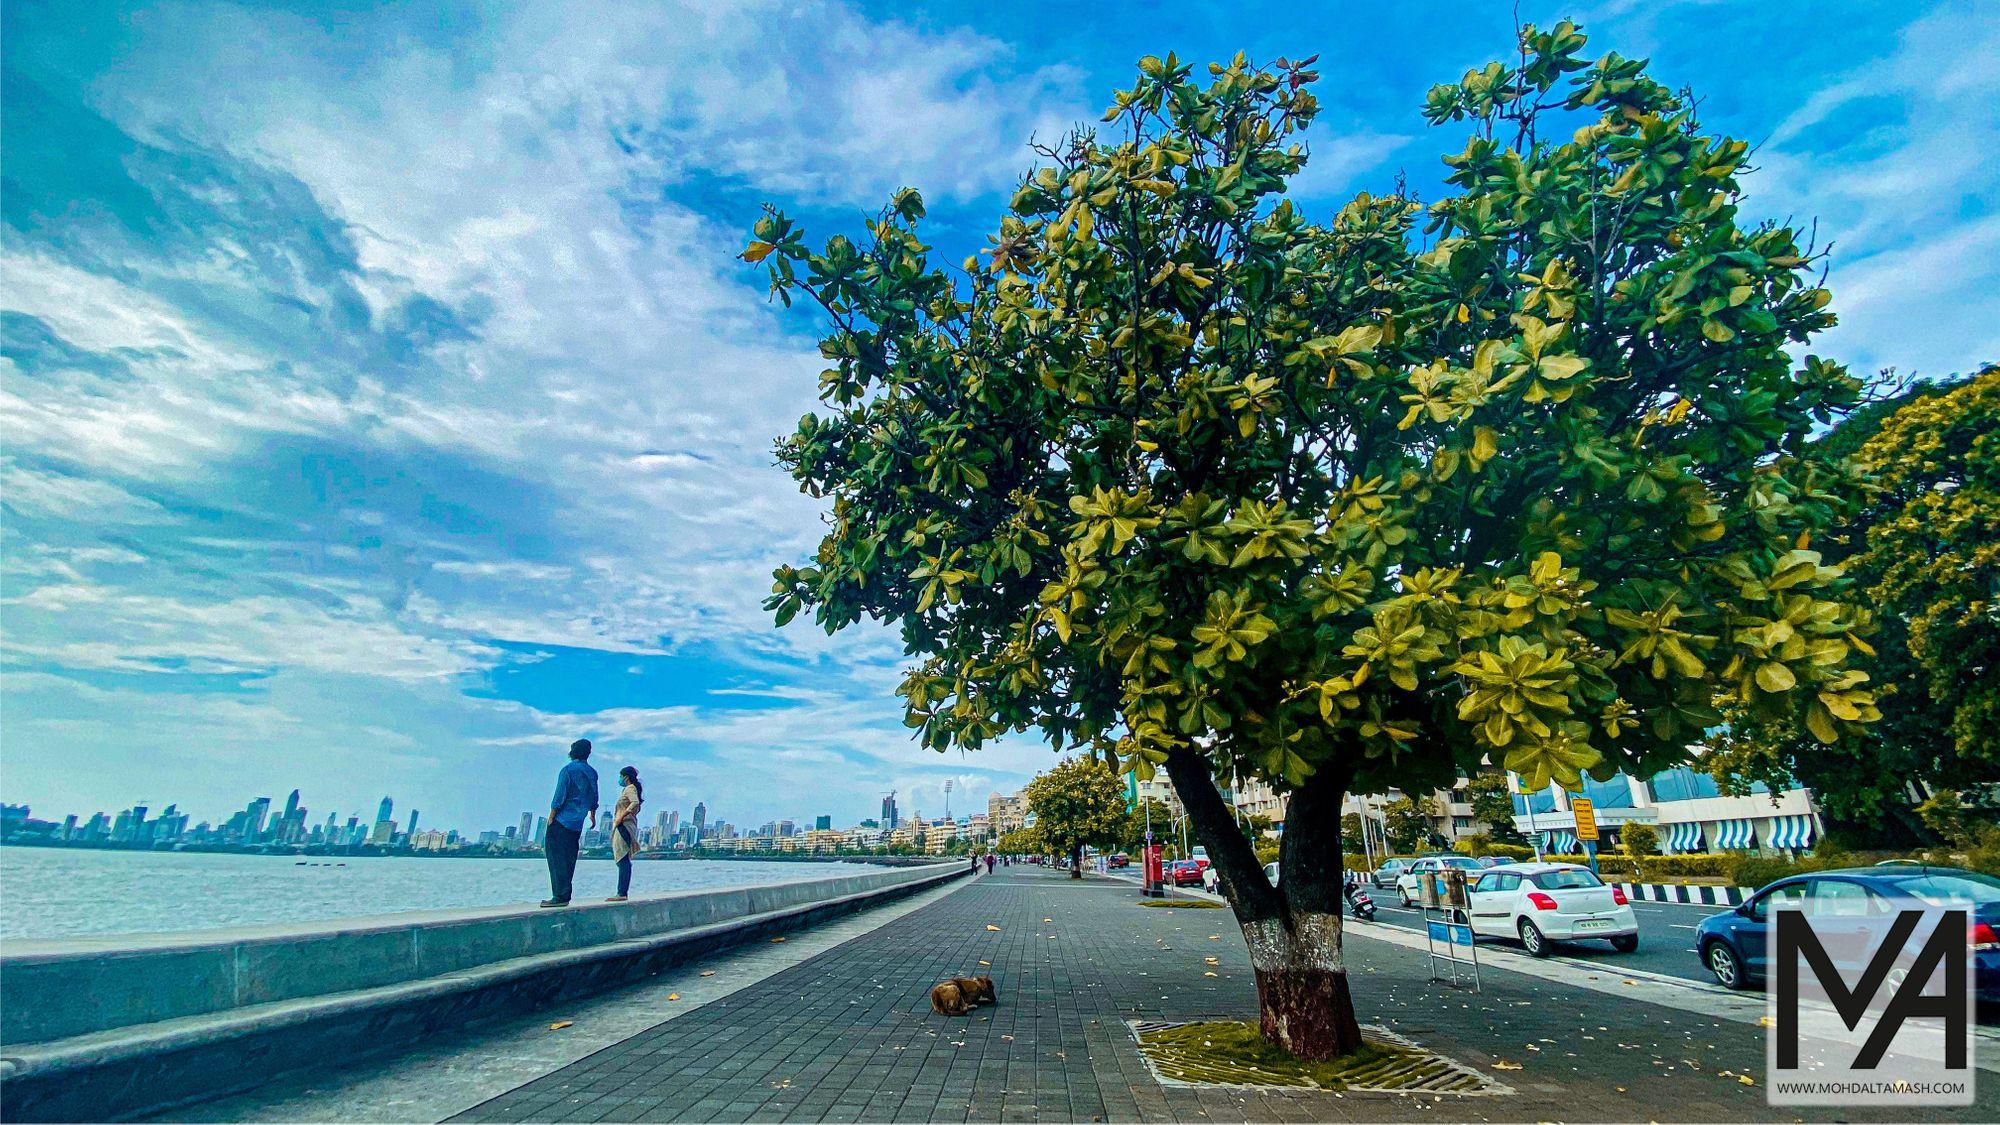 Couples enjoying the weather at Marine Drive Mumbai during rains.  #PicOfTheDay #PhotographyEveryday #PhotographySouls #PhotoOfTheDay #ExclusiveShots #PhotographyIsLife #iphonephotography #PhotographDaily #Composition #Photoshop #HDR #PhotographyAddict #exposure #ThroughTheLens #PhotographyLovers #PhotographyLife #PhotoOfTheDay #mohdaltamash